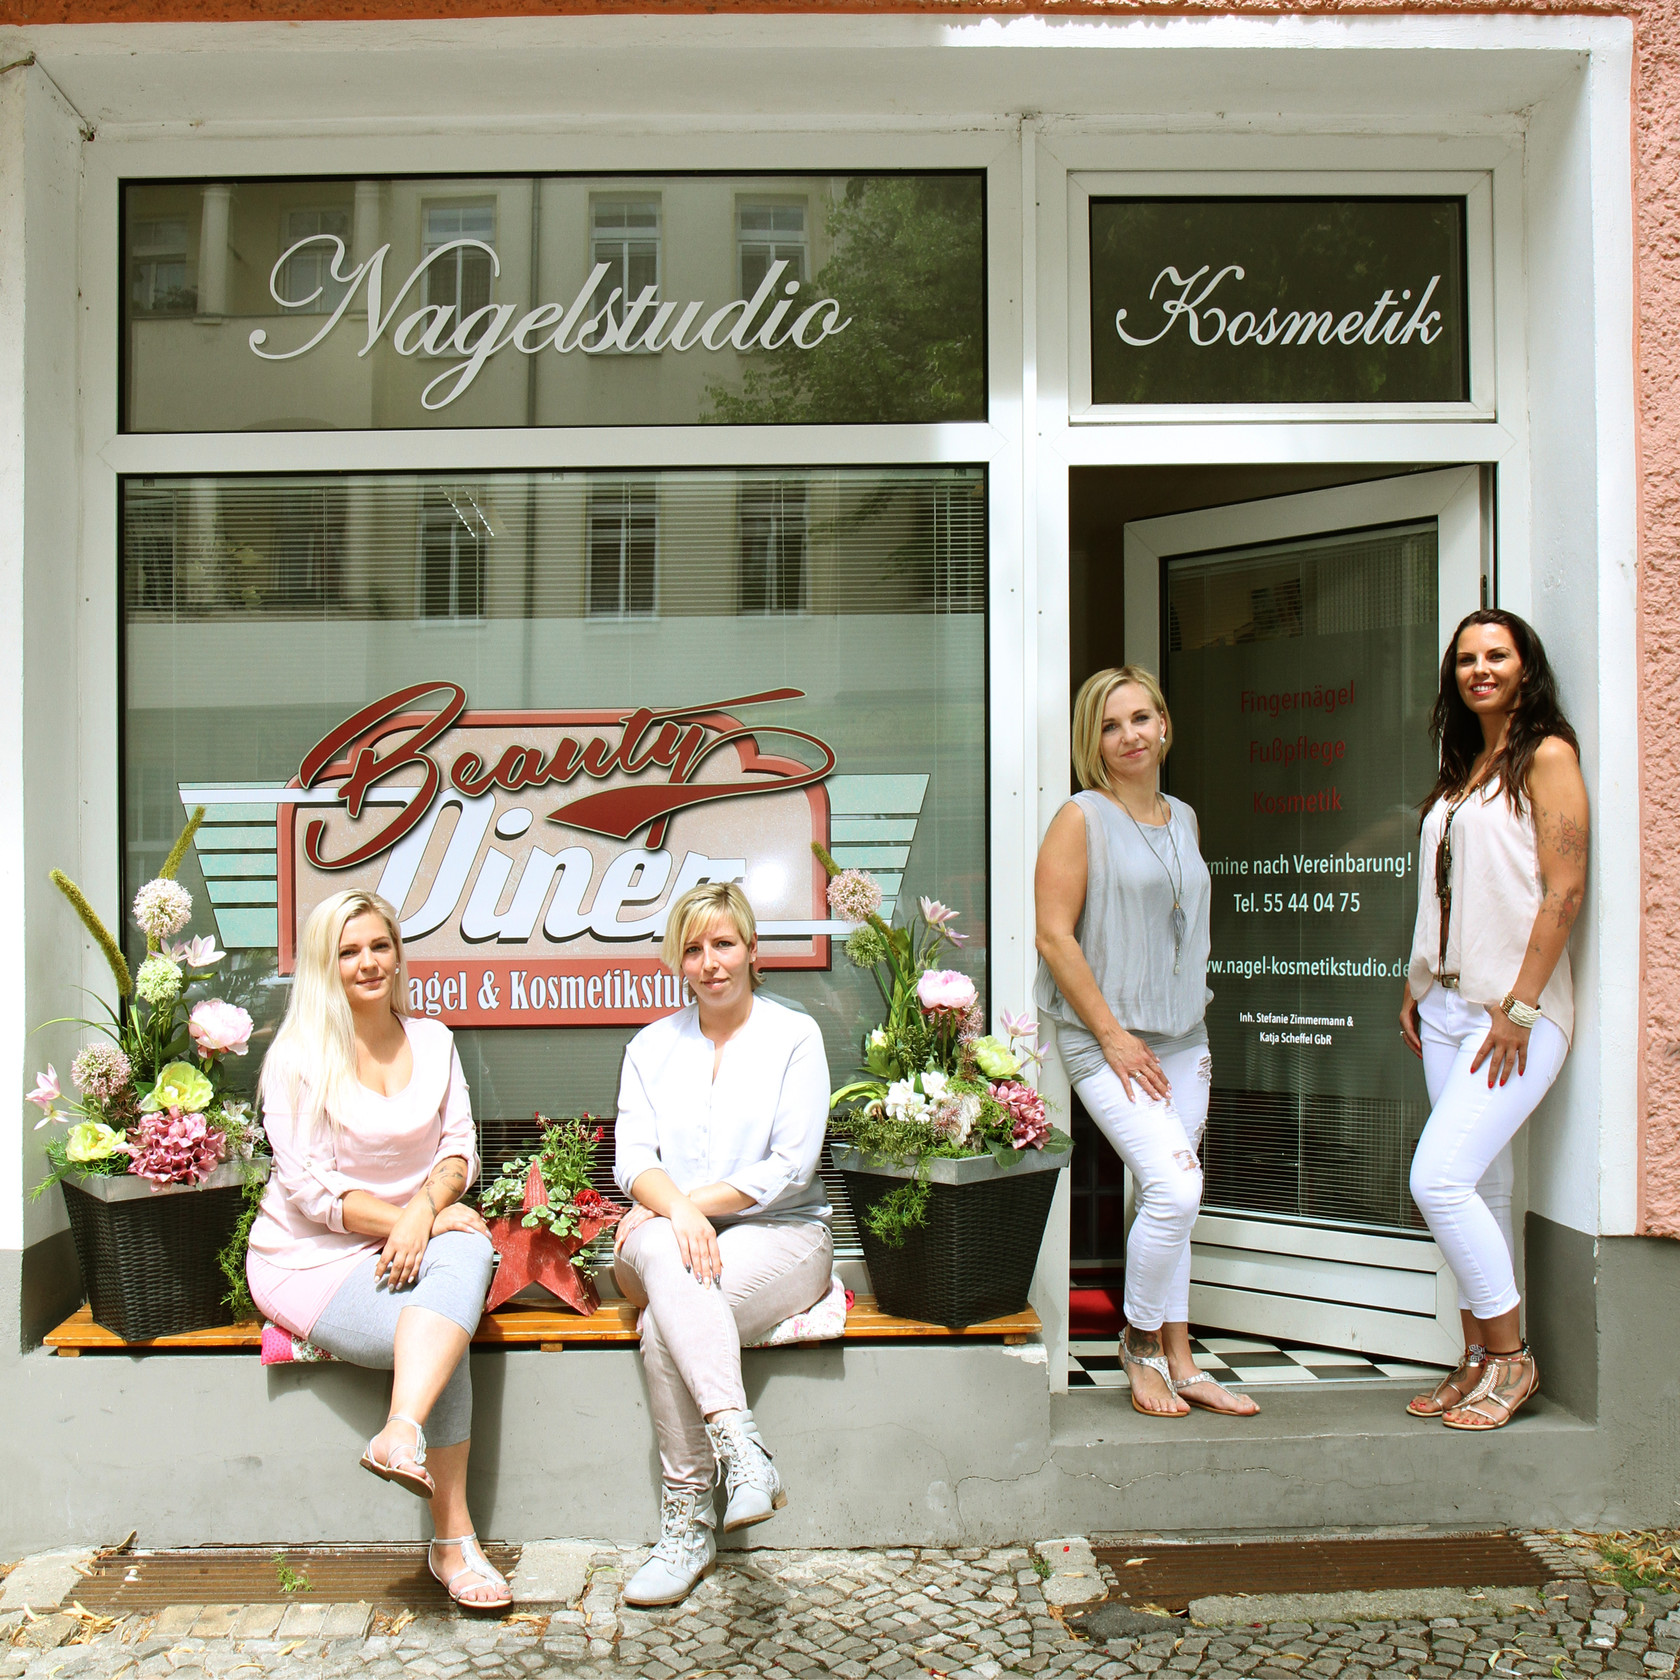 beauty diner nagel und kosmetikstudio in berlin. Black Bedroom Furniture Sets. Home Design Ideas